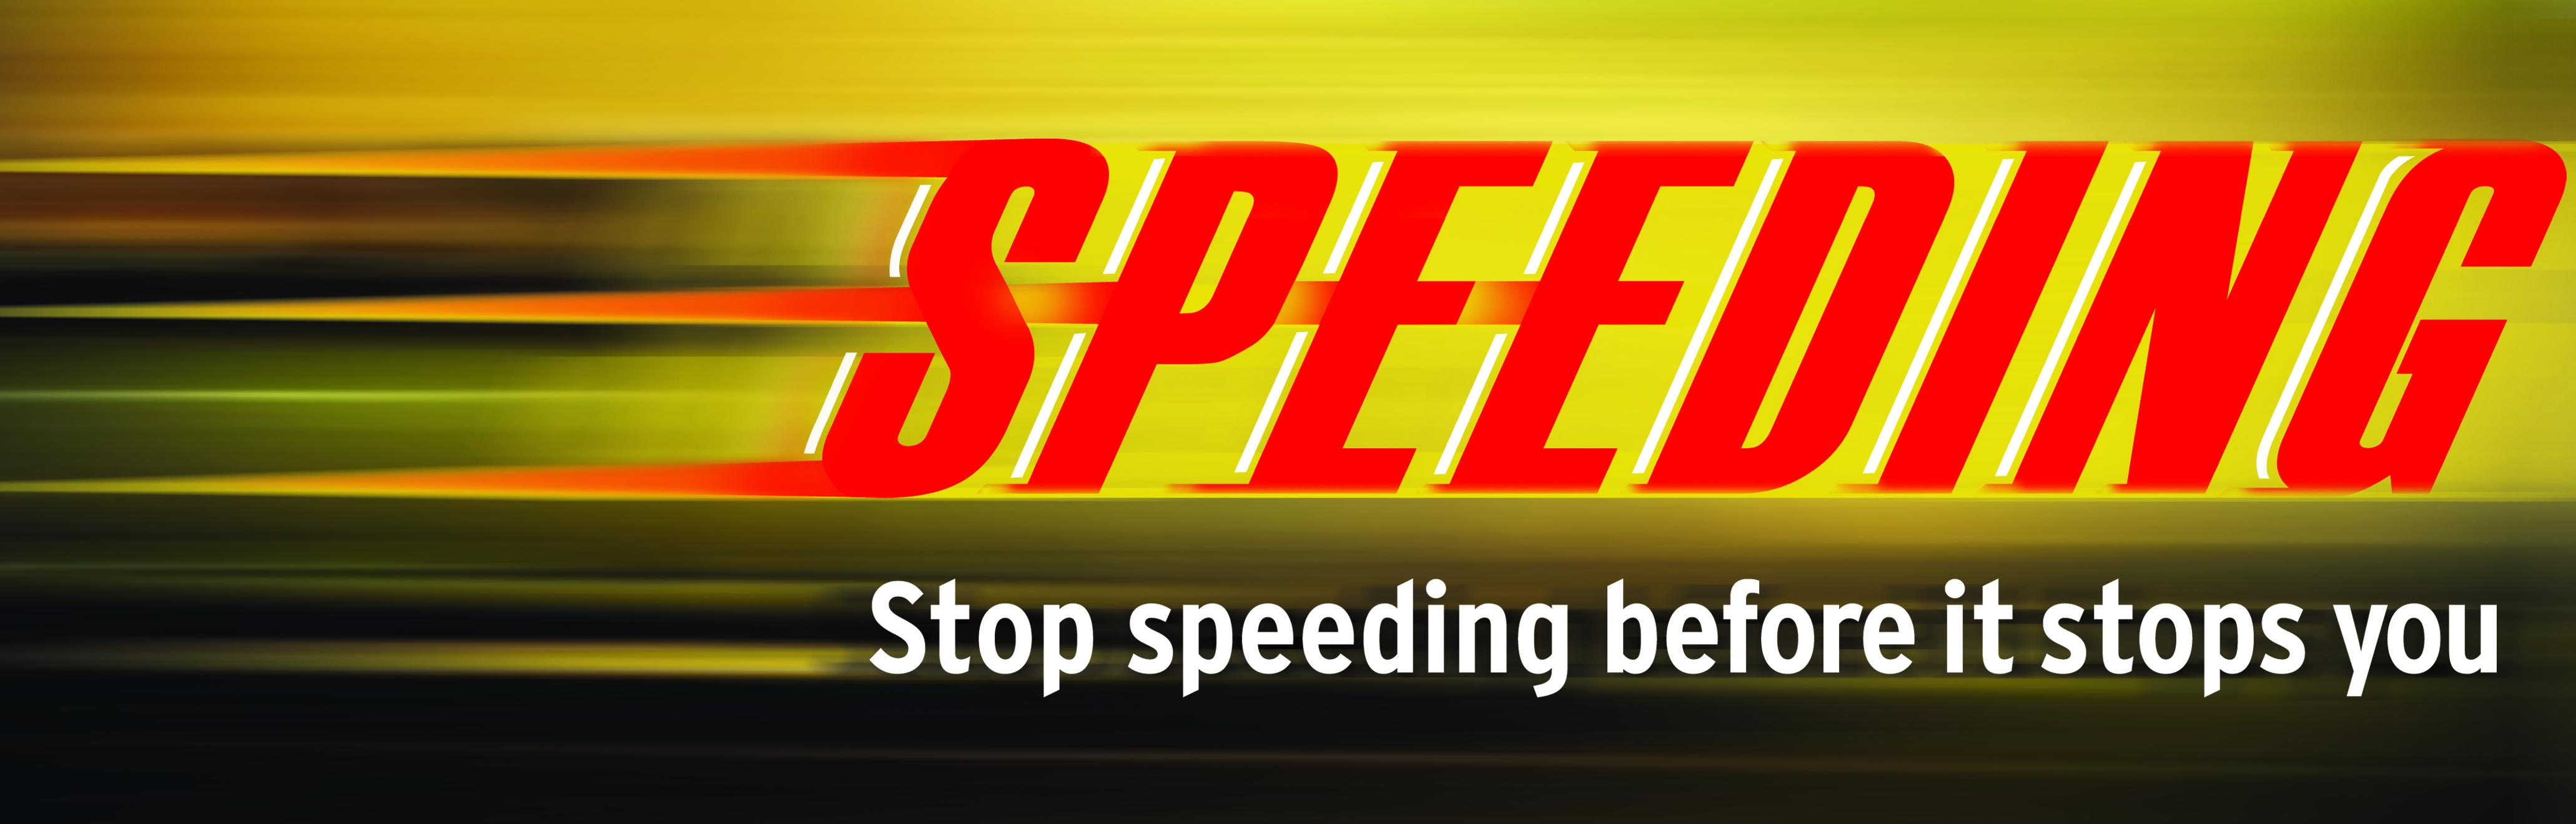 Speed Campaign Toolkit   Stop Speeding   Traffic Safety Marketing ...: https://icsw.nhtsa.gov/newtsm/tk-speeding/